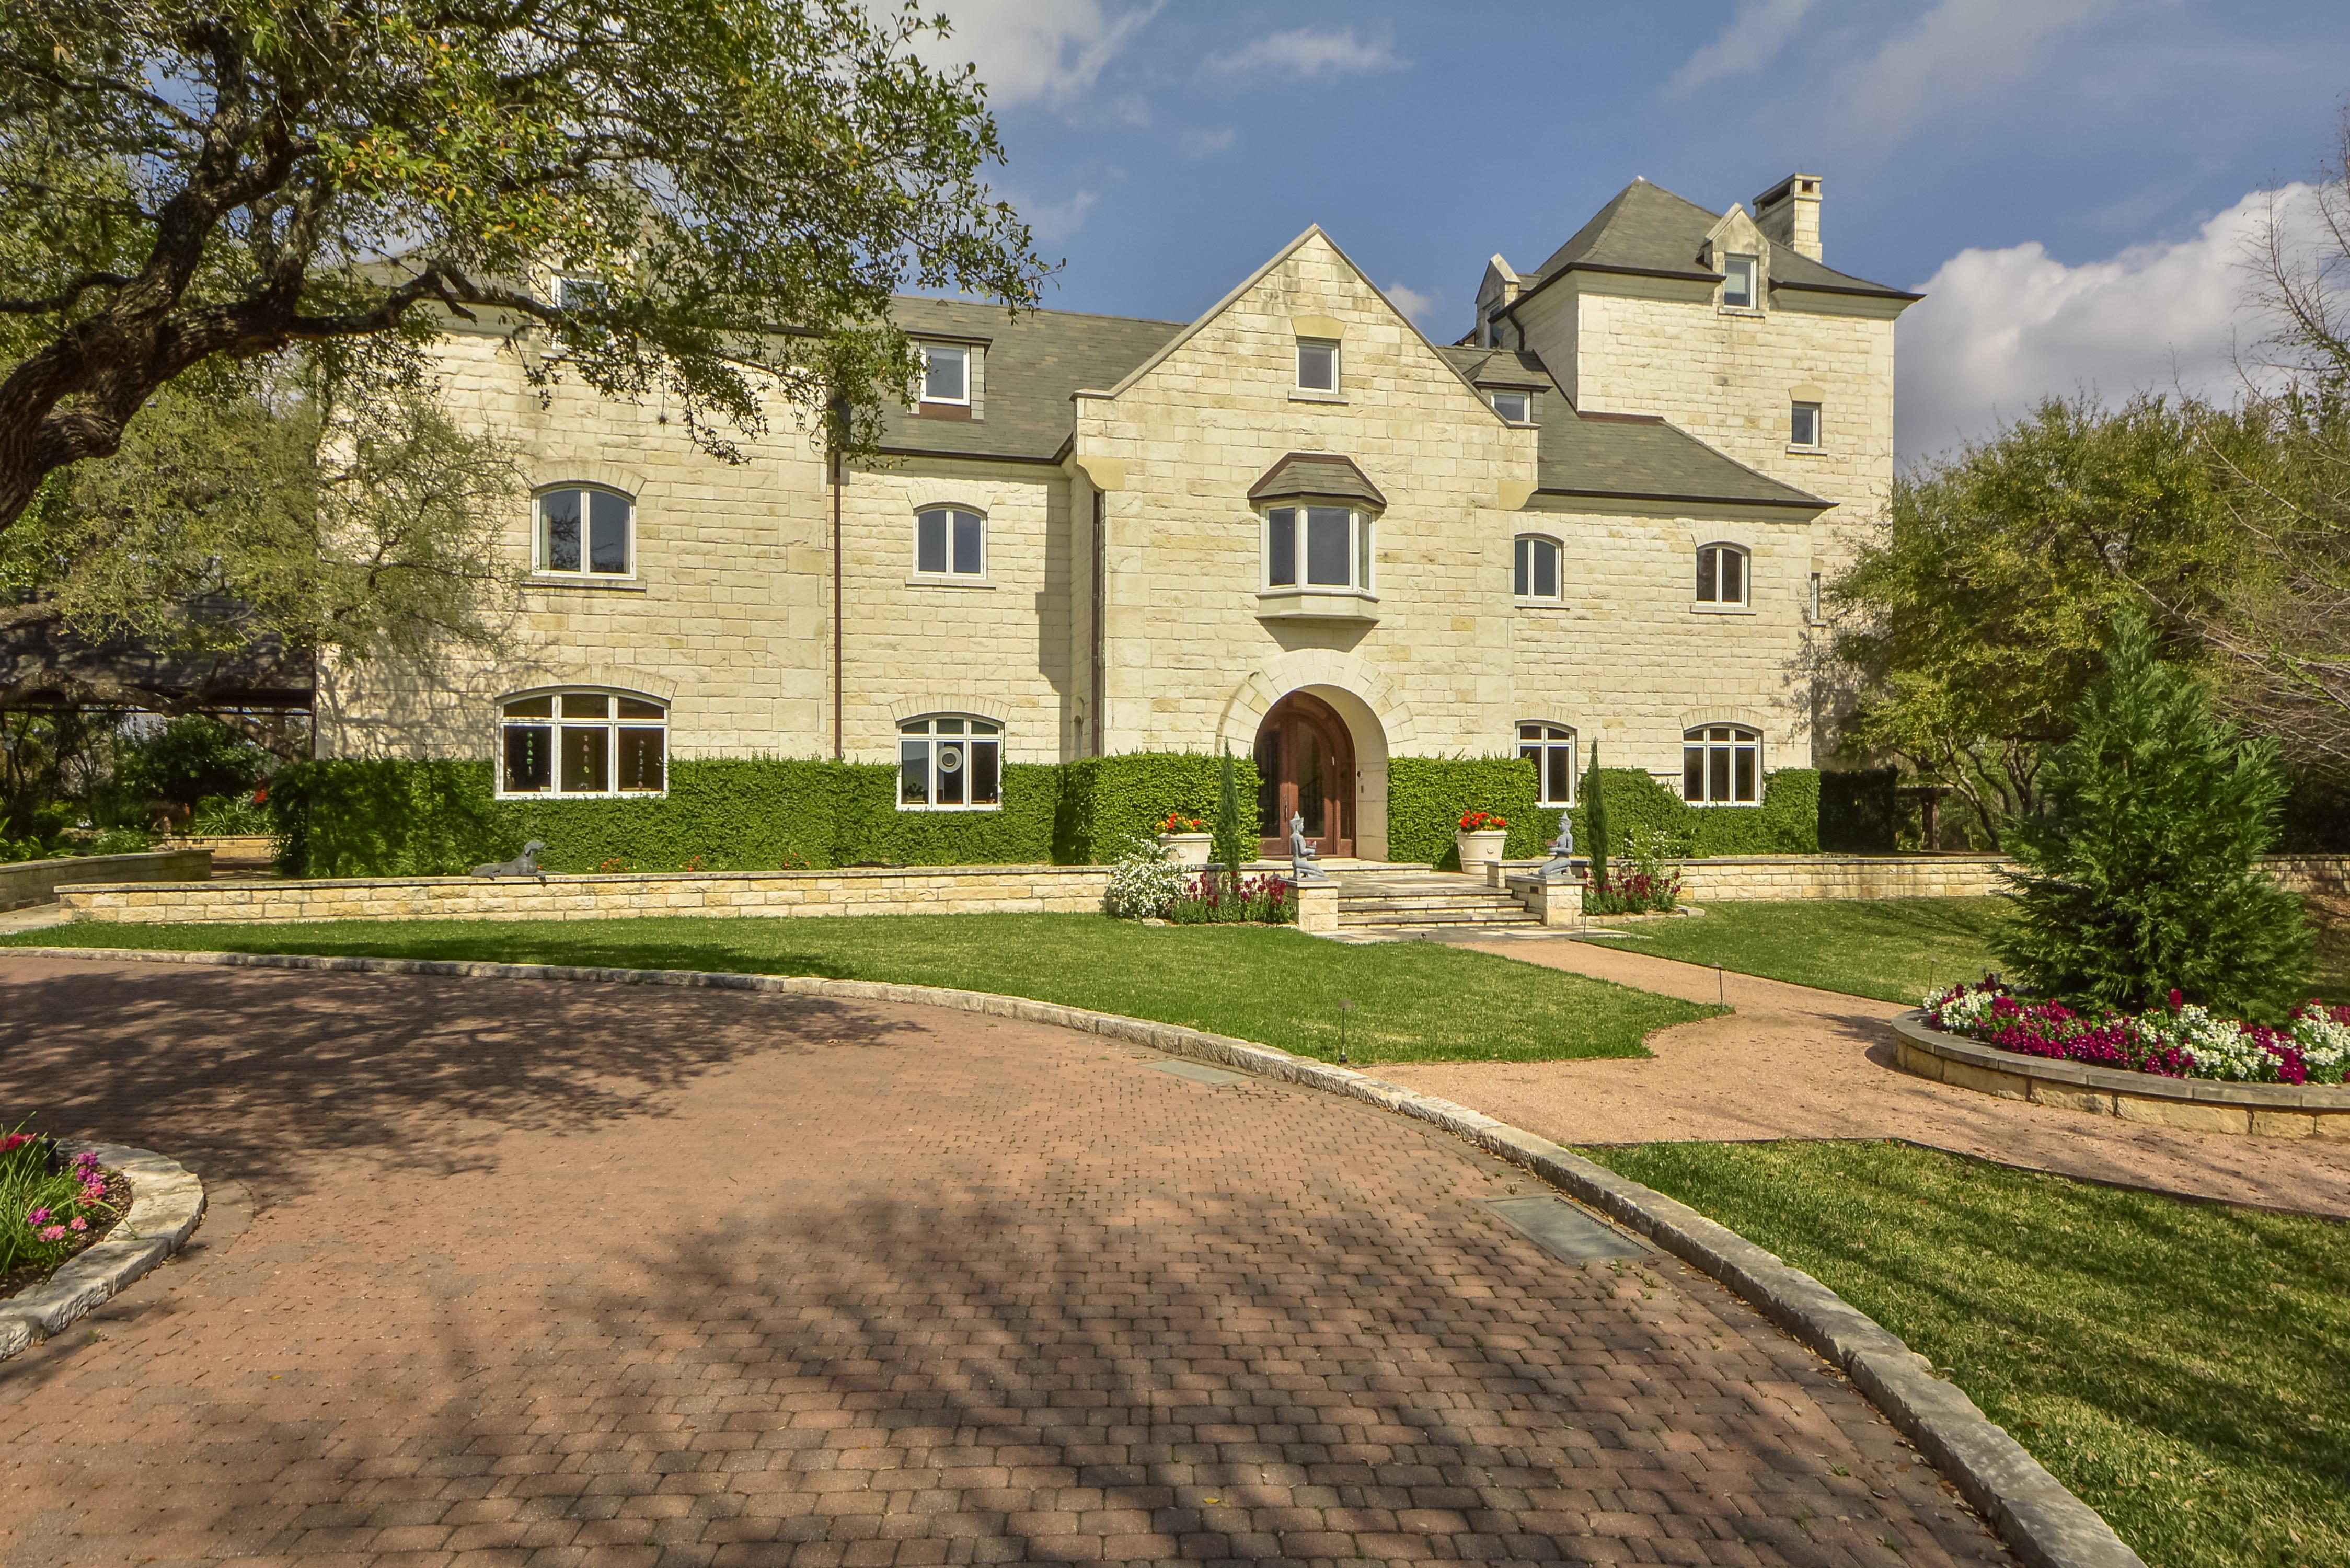 British-style white stone mansion